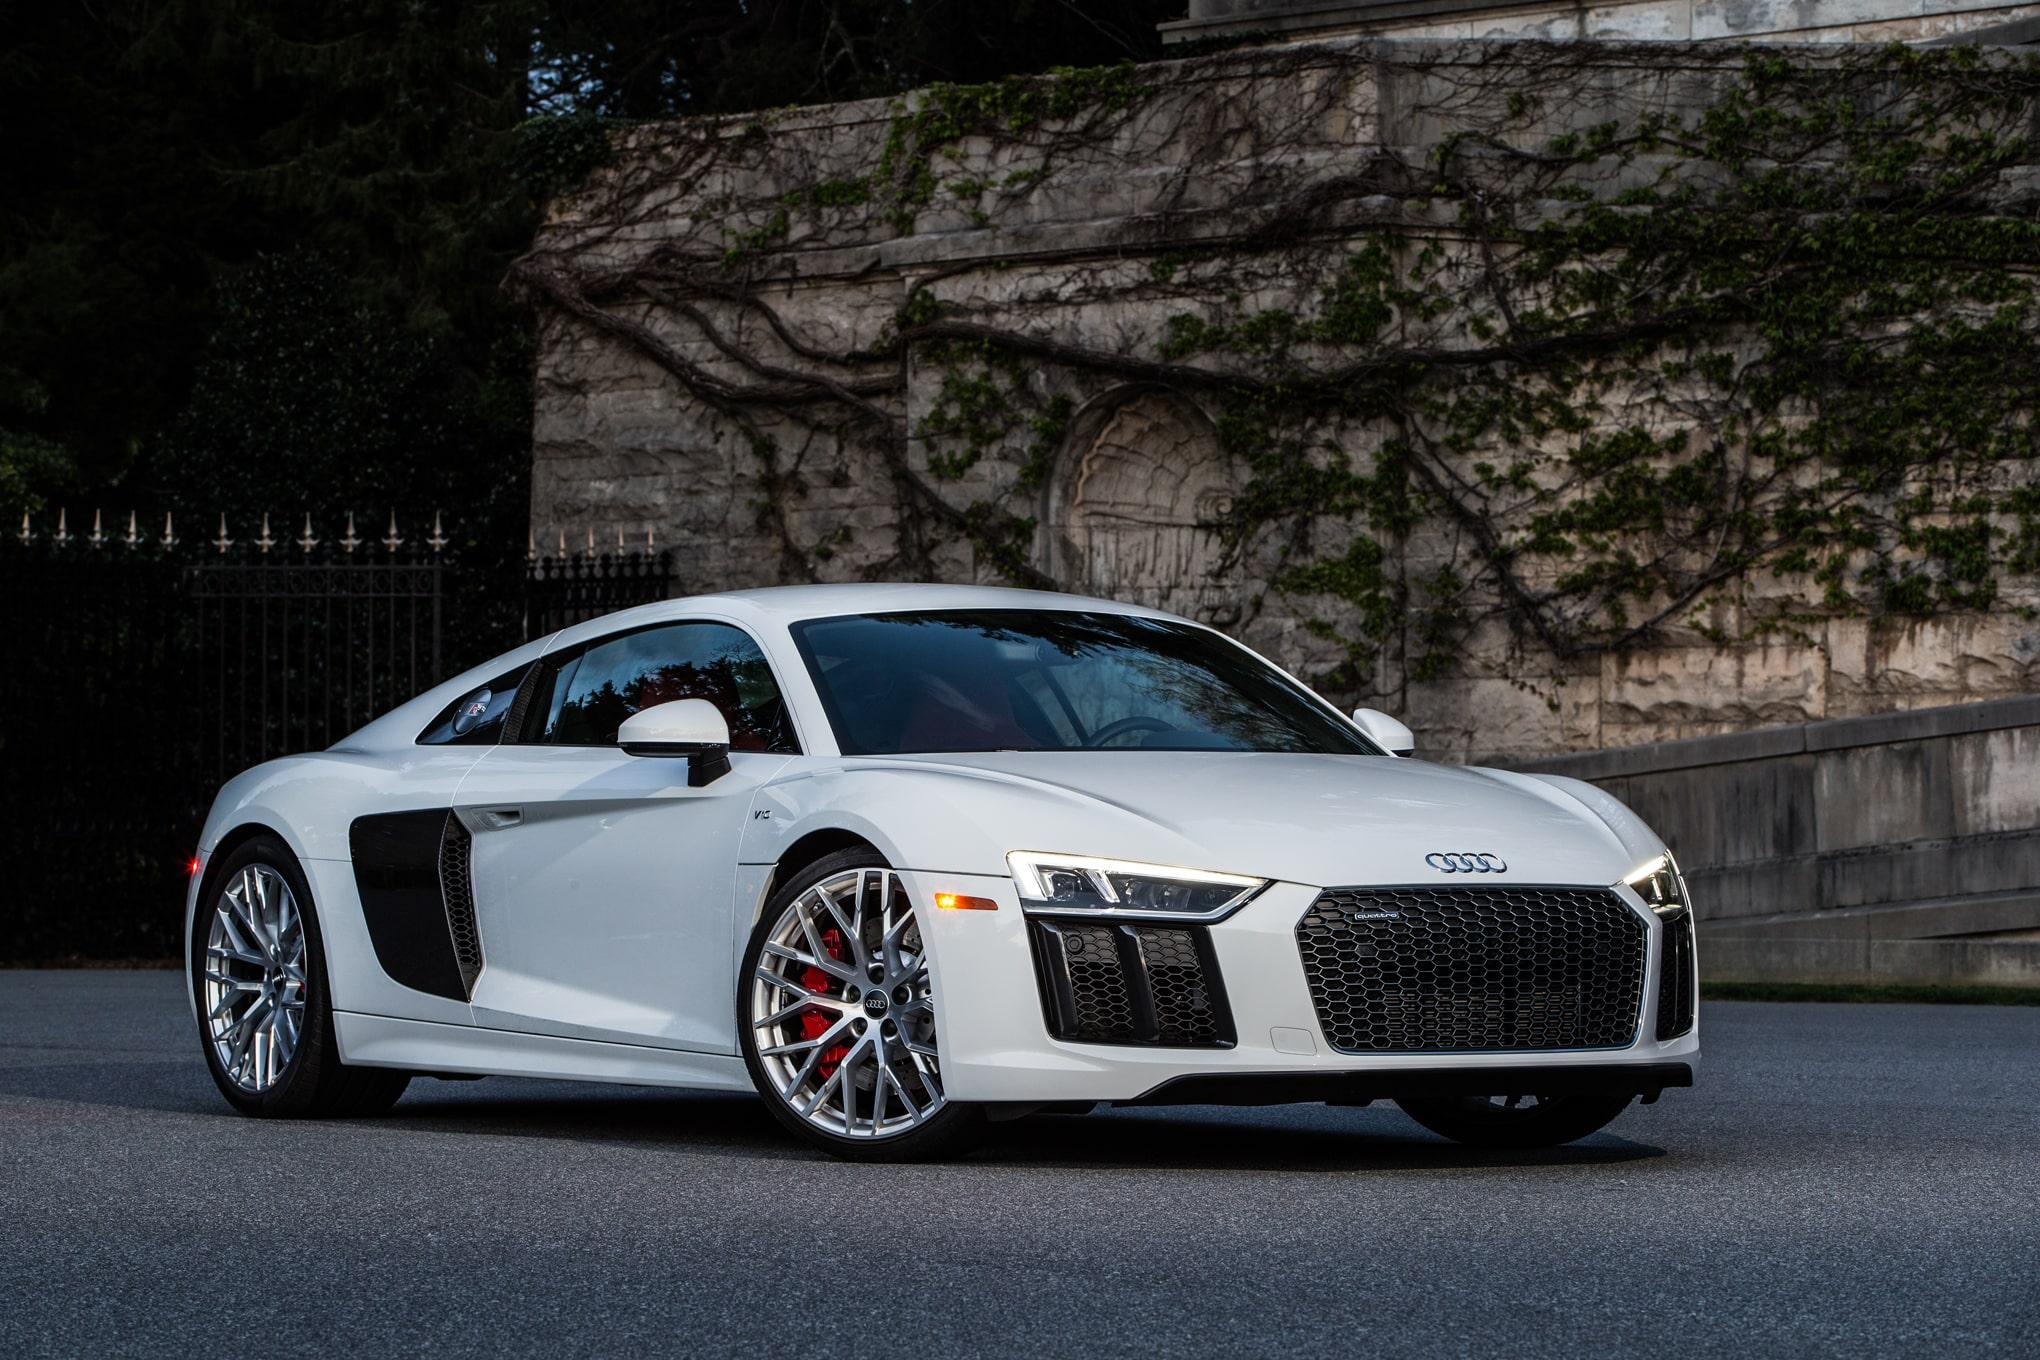 Superb 2017 Audi R8